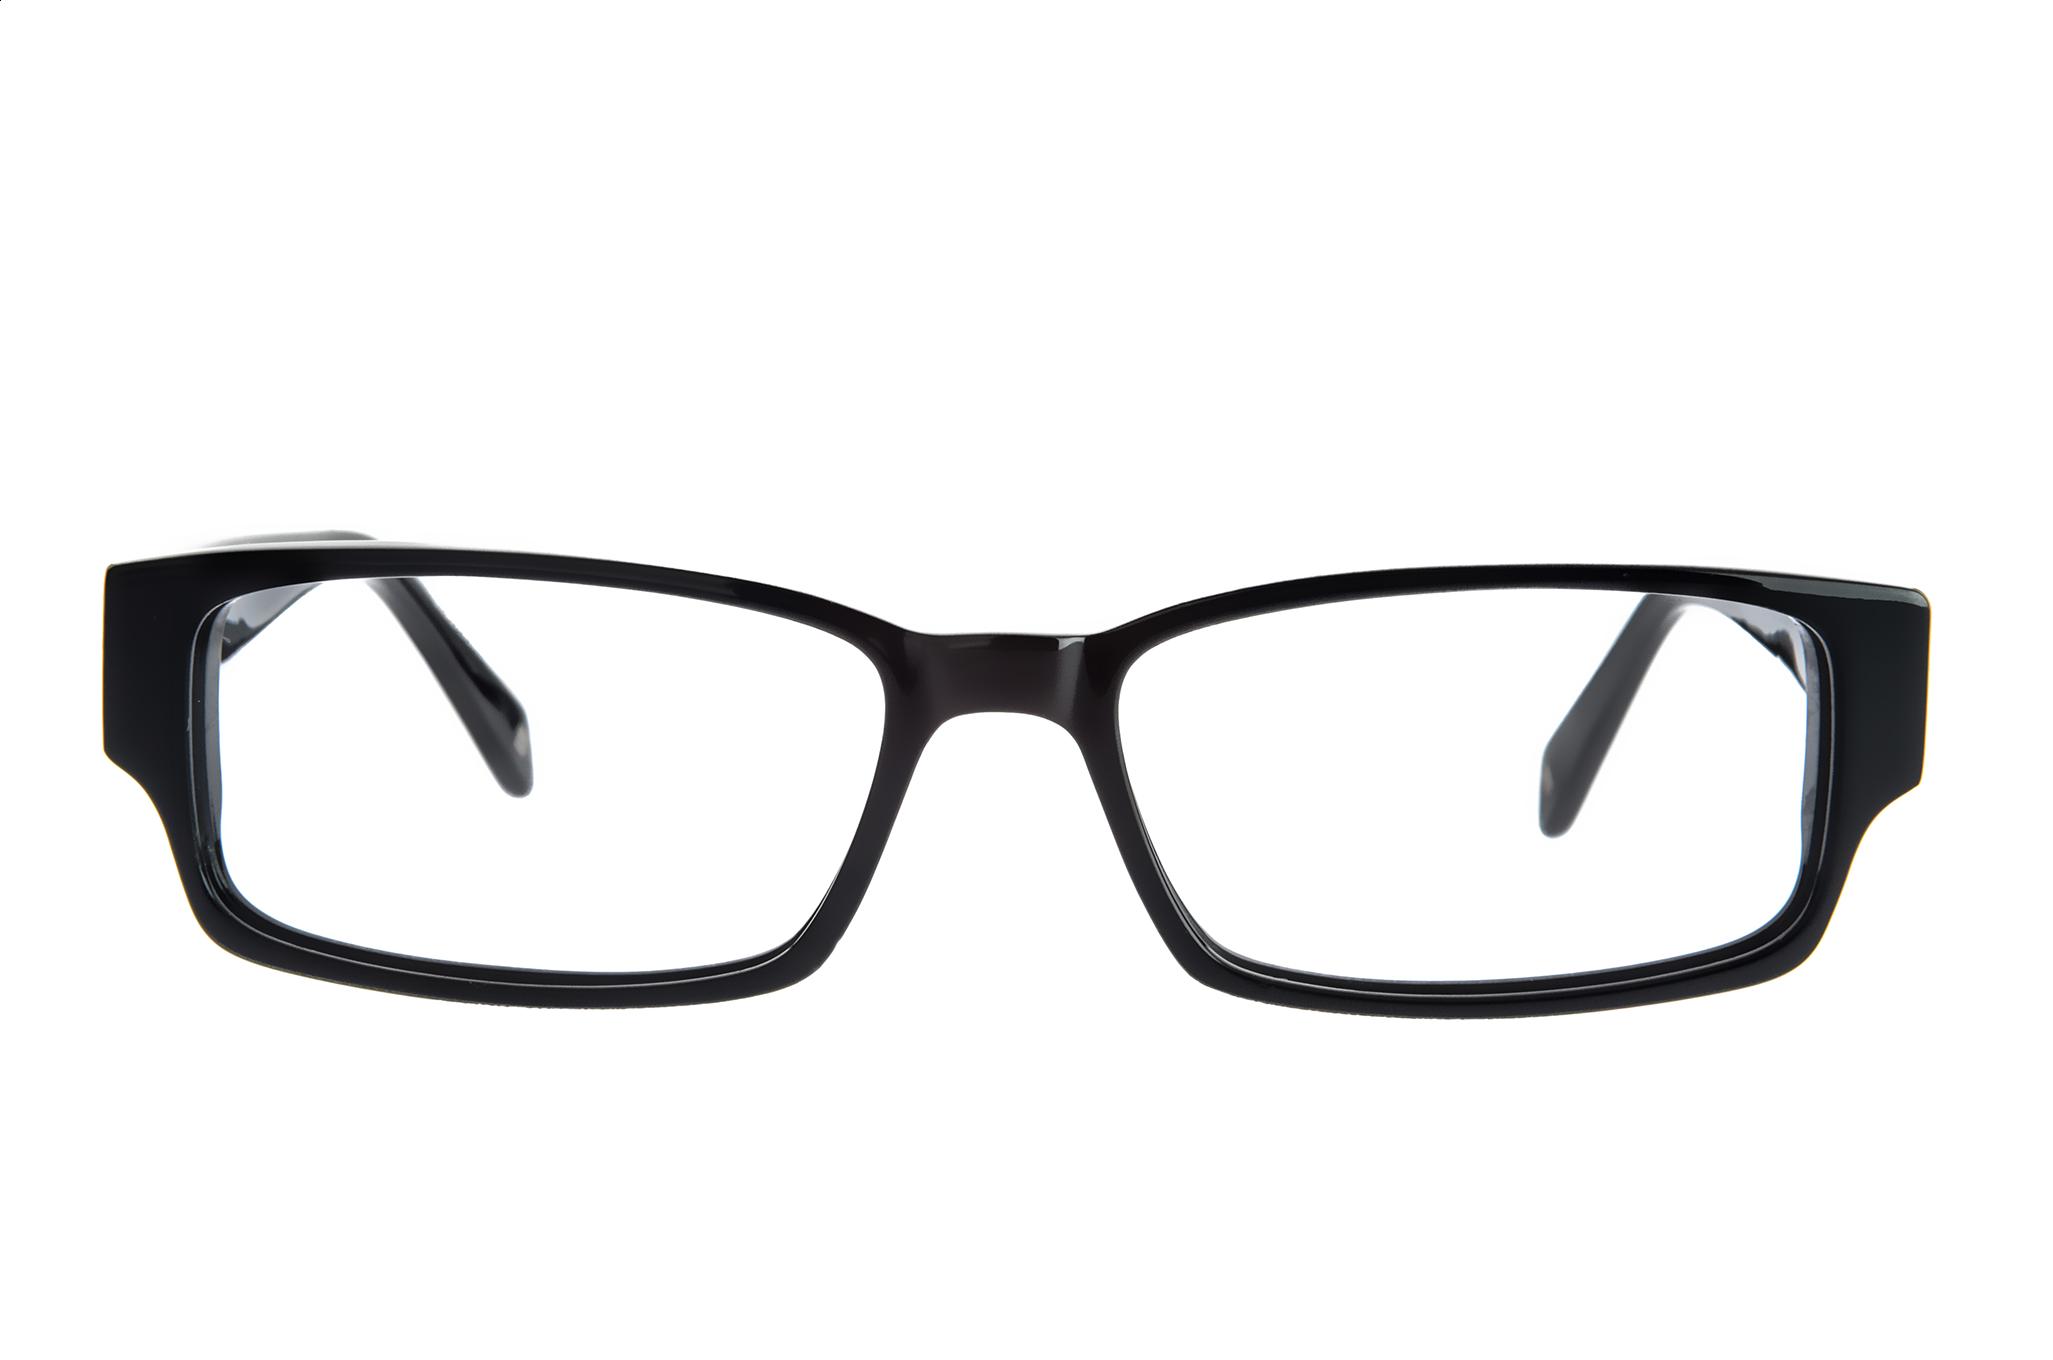 Sun glass cutout clipart graphic free library Aviator Sunglasses Png   Clipart Panda - Free Clipart Images graphic free library